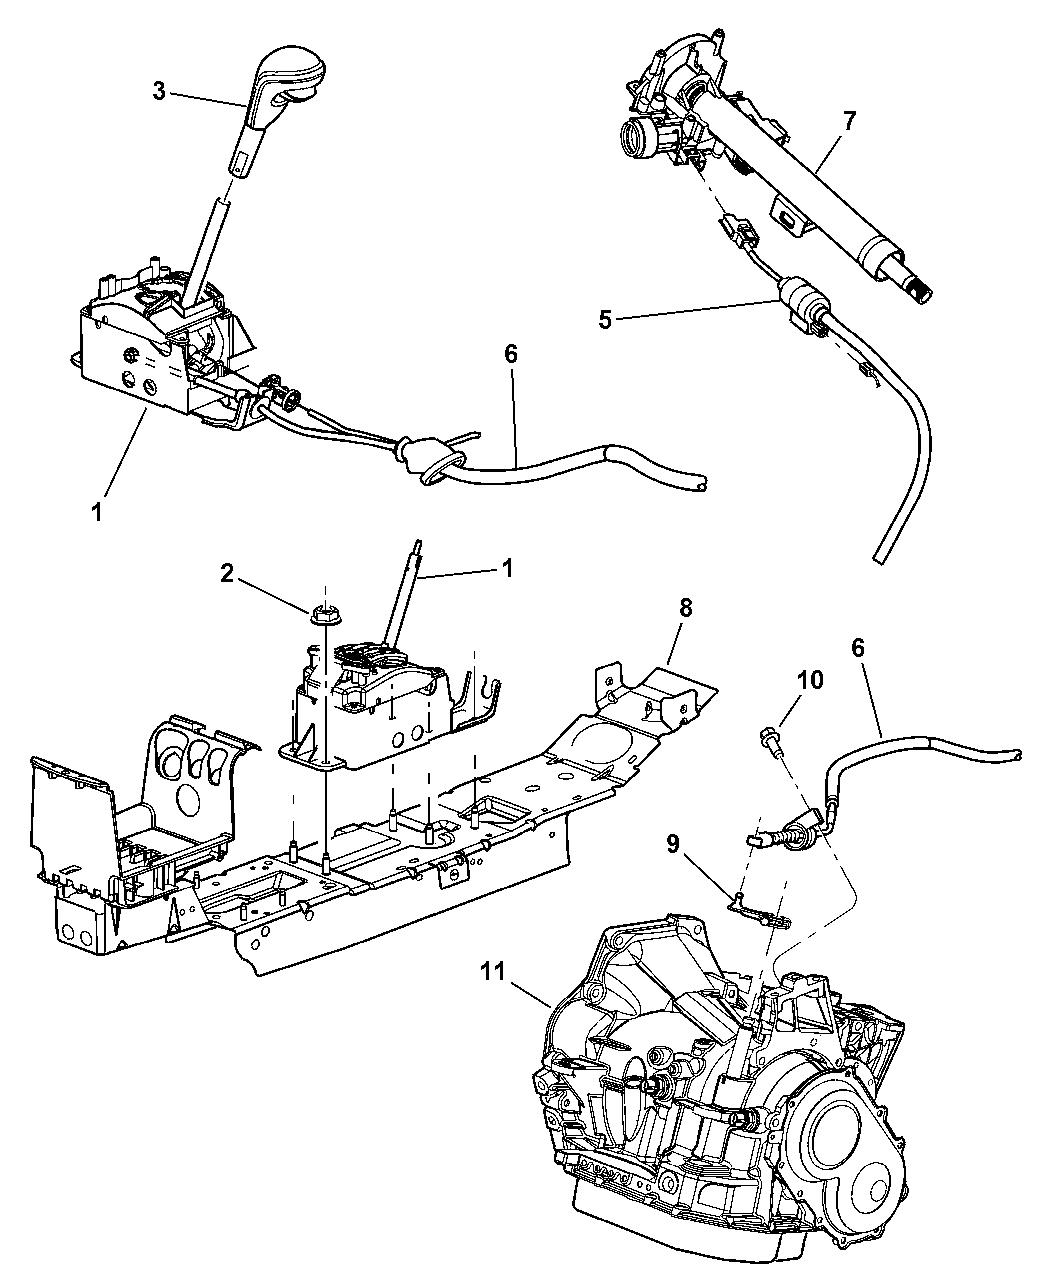 2002 Chrysler Sebring Sedan & Convertible Gear Shift Control